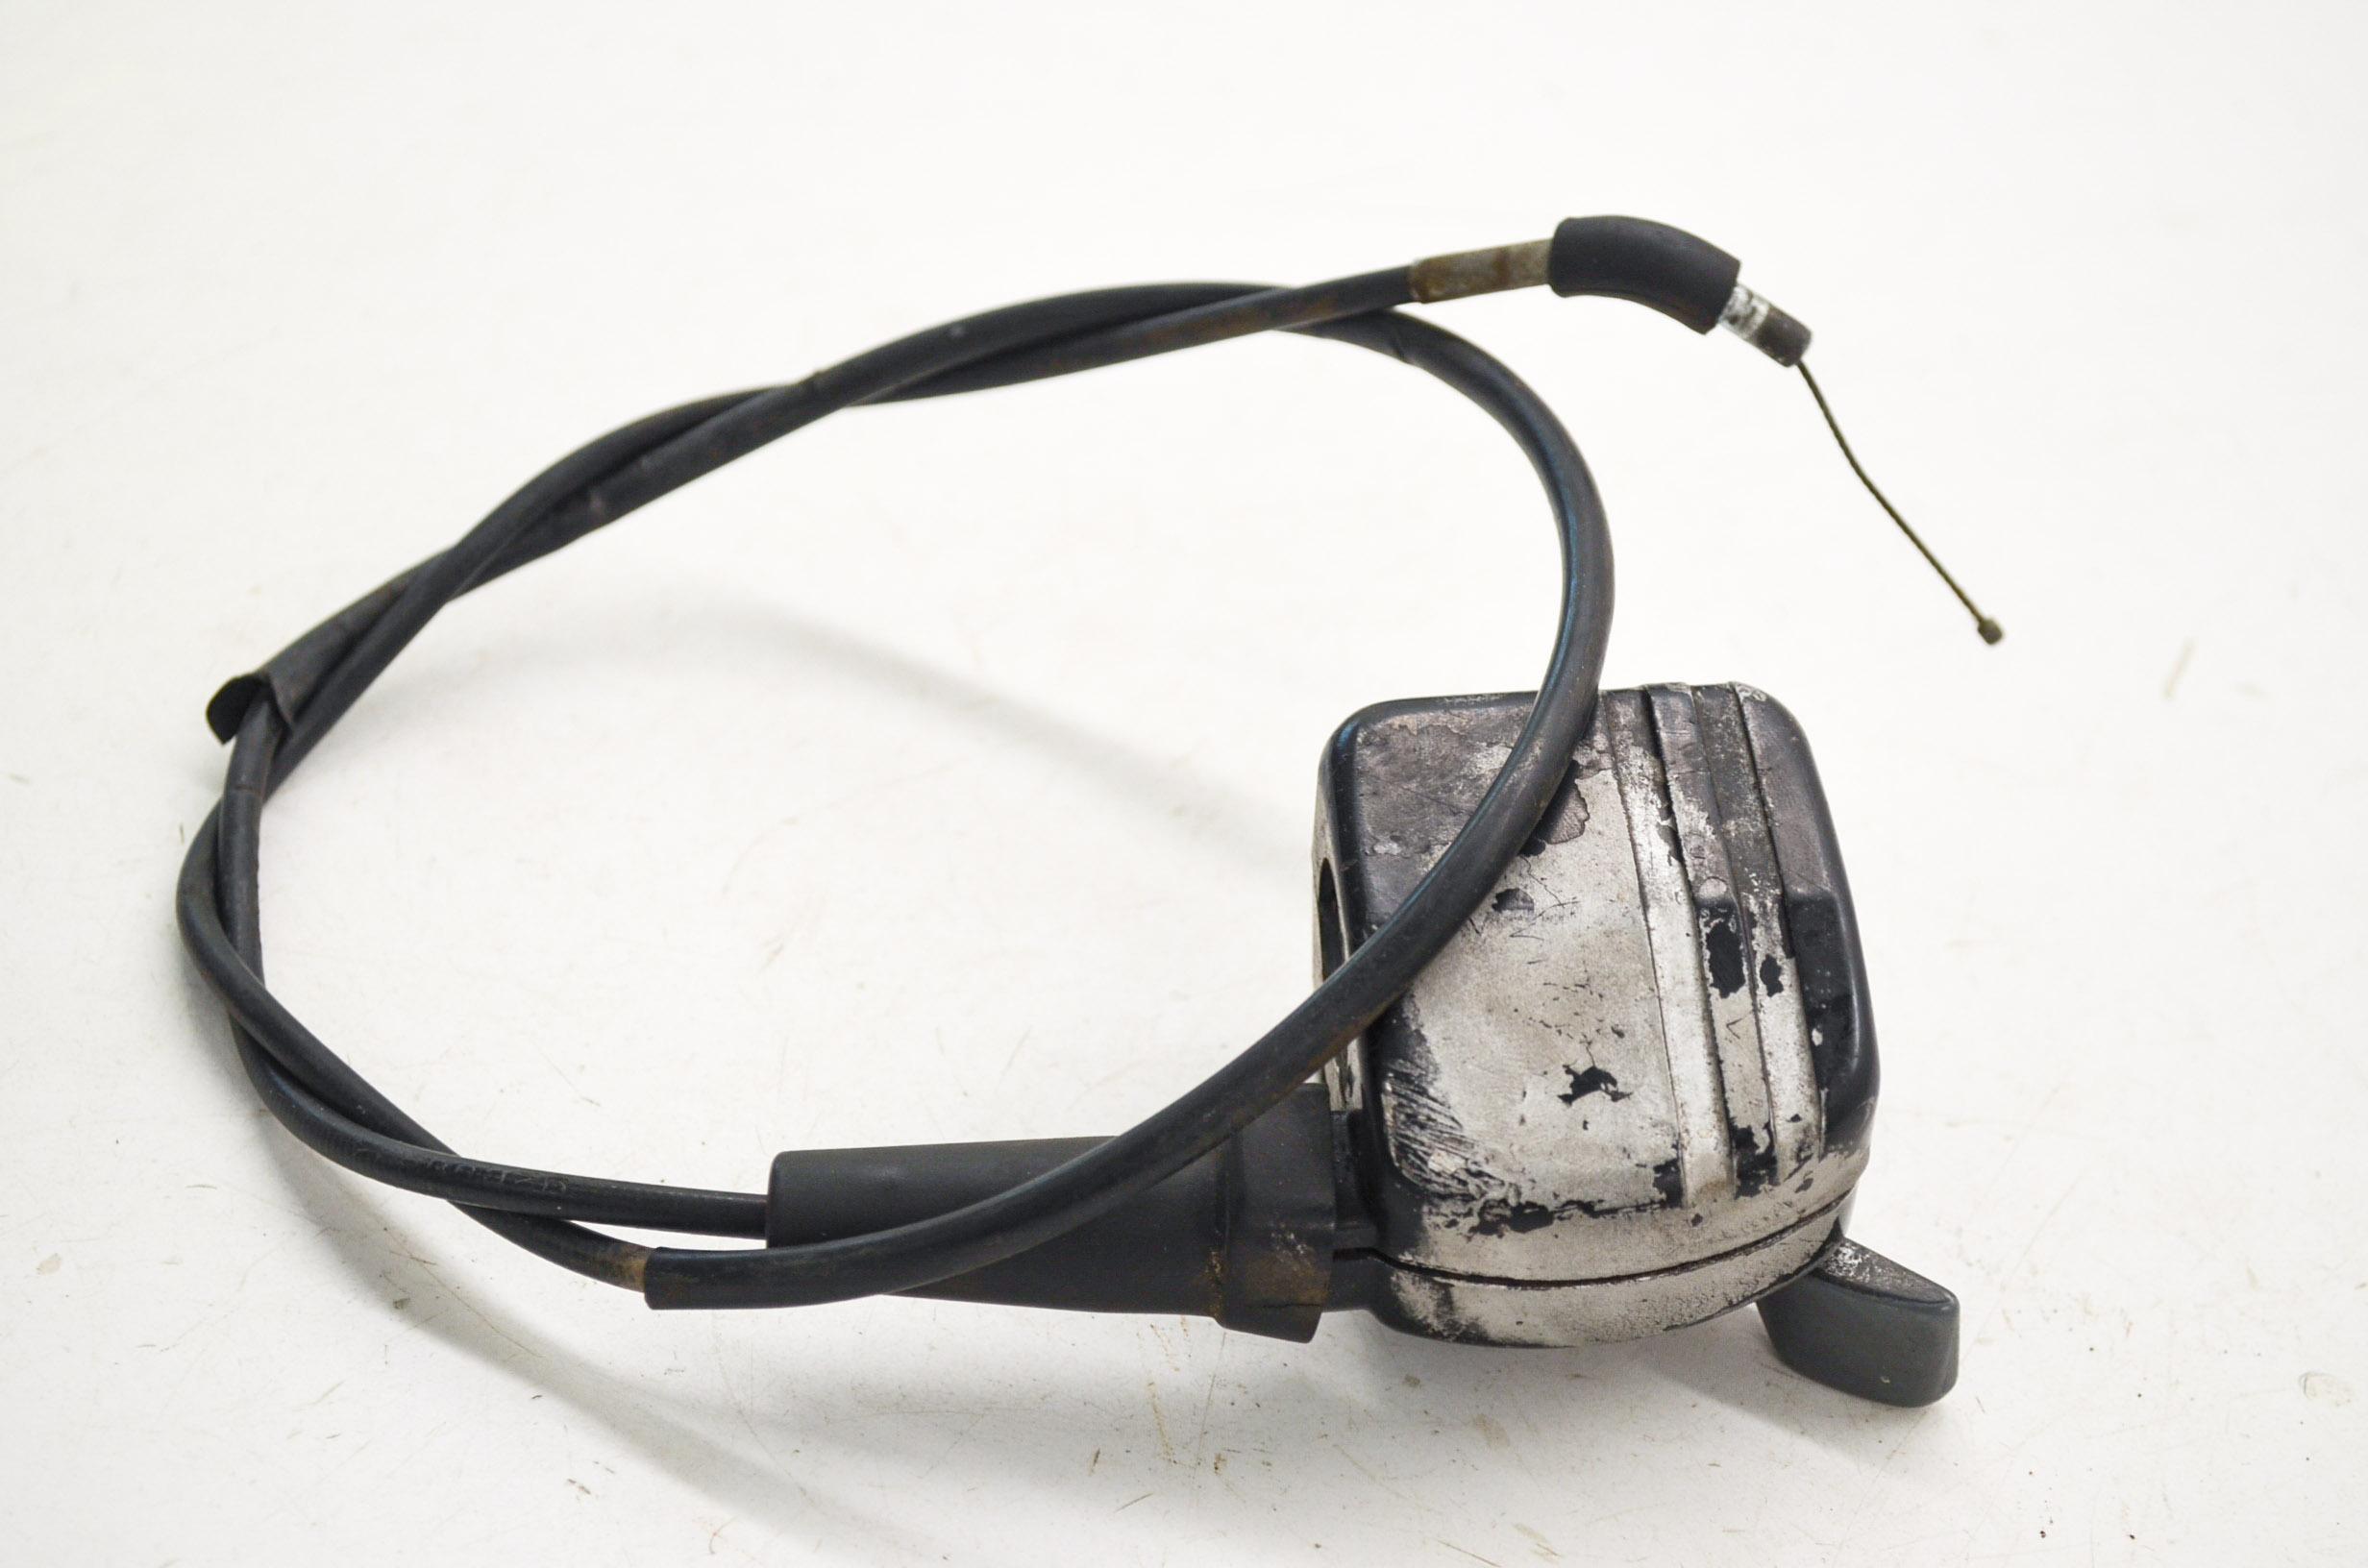 89 suzuki quad runner 160 thumb throttle & cable lt160e 2x4 | ebay